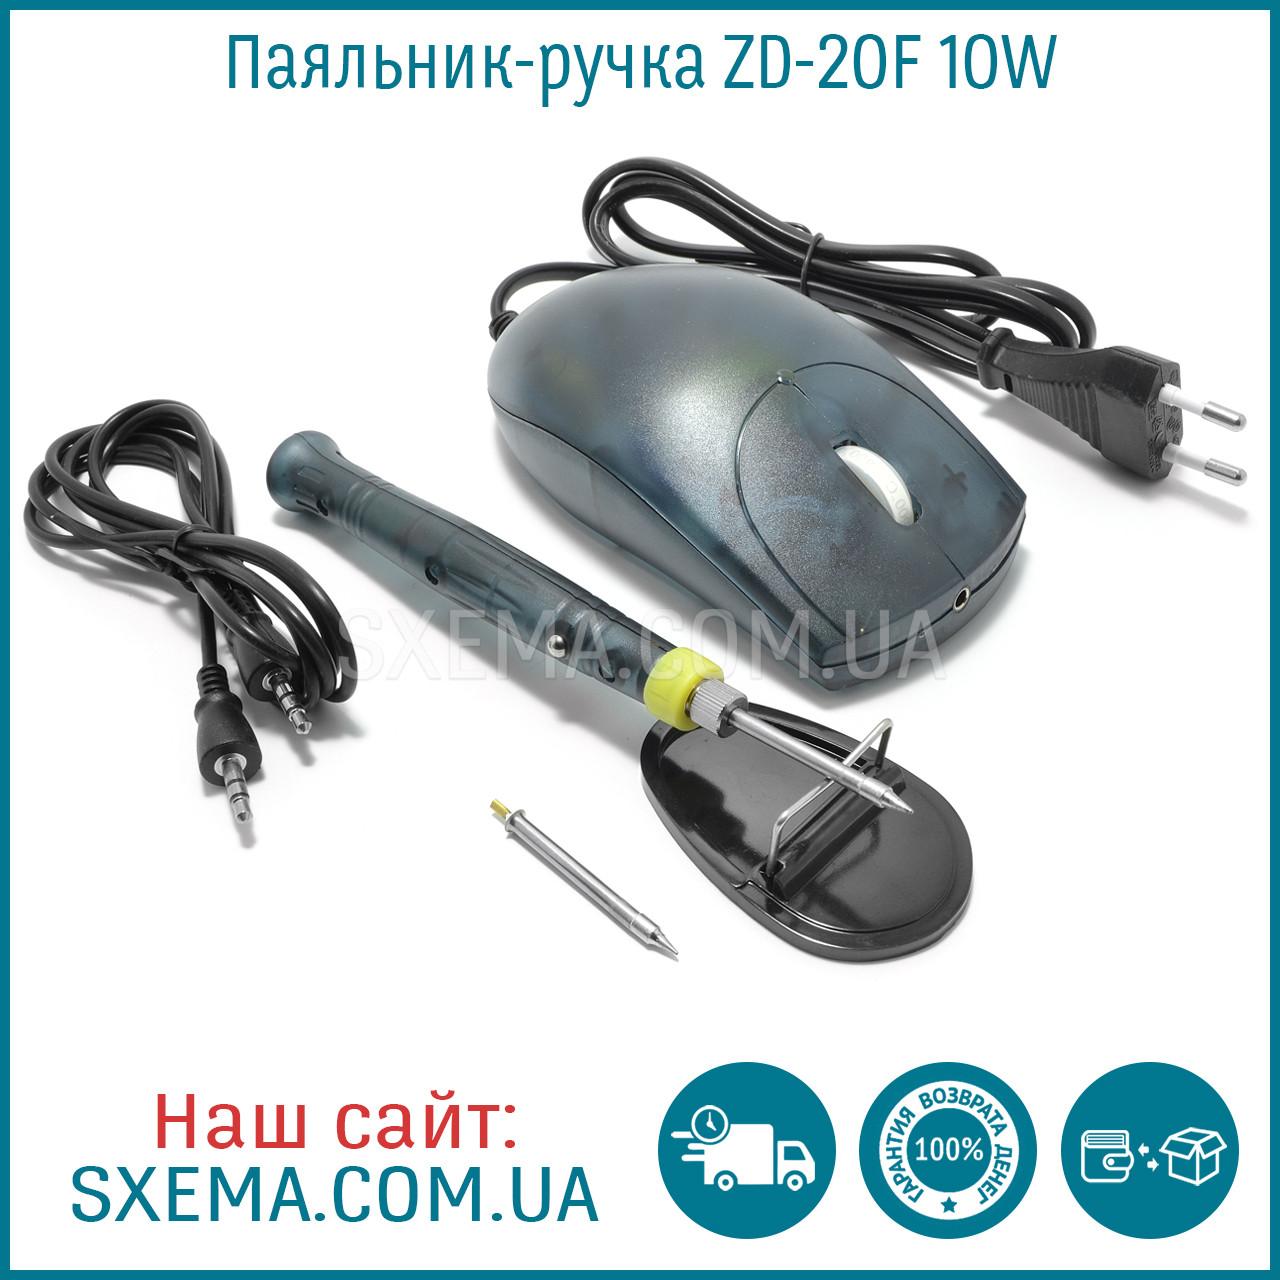 Паяльник-ручка ZD-20F 10W, 220V + жало, фото 1